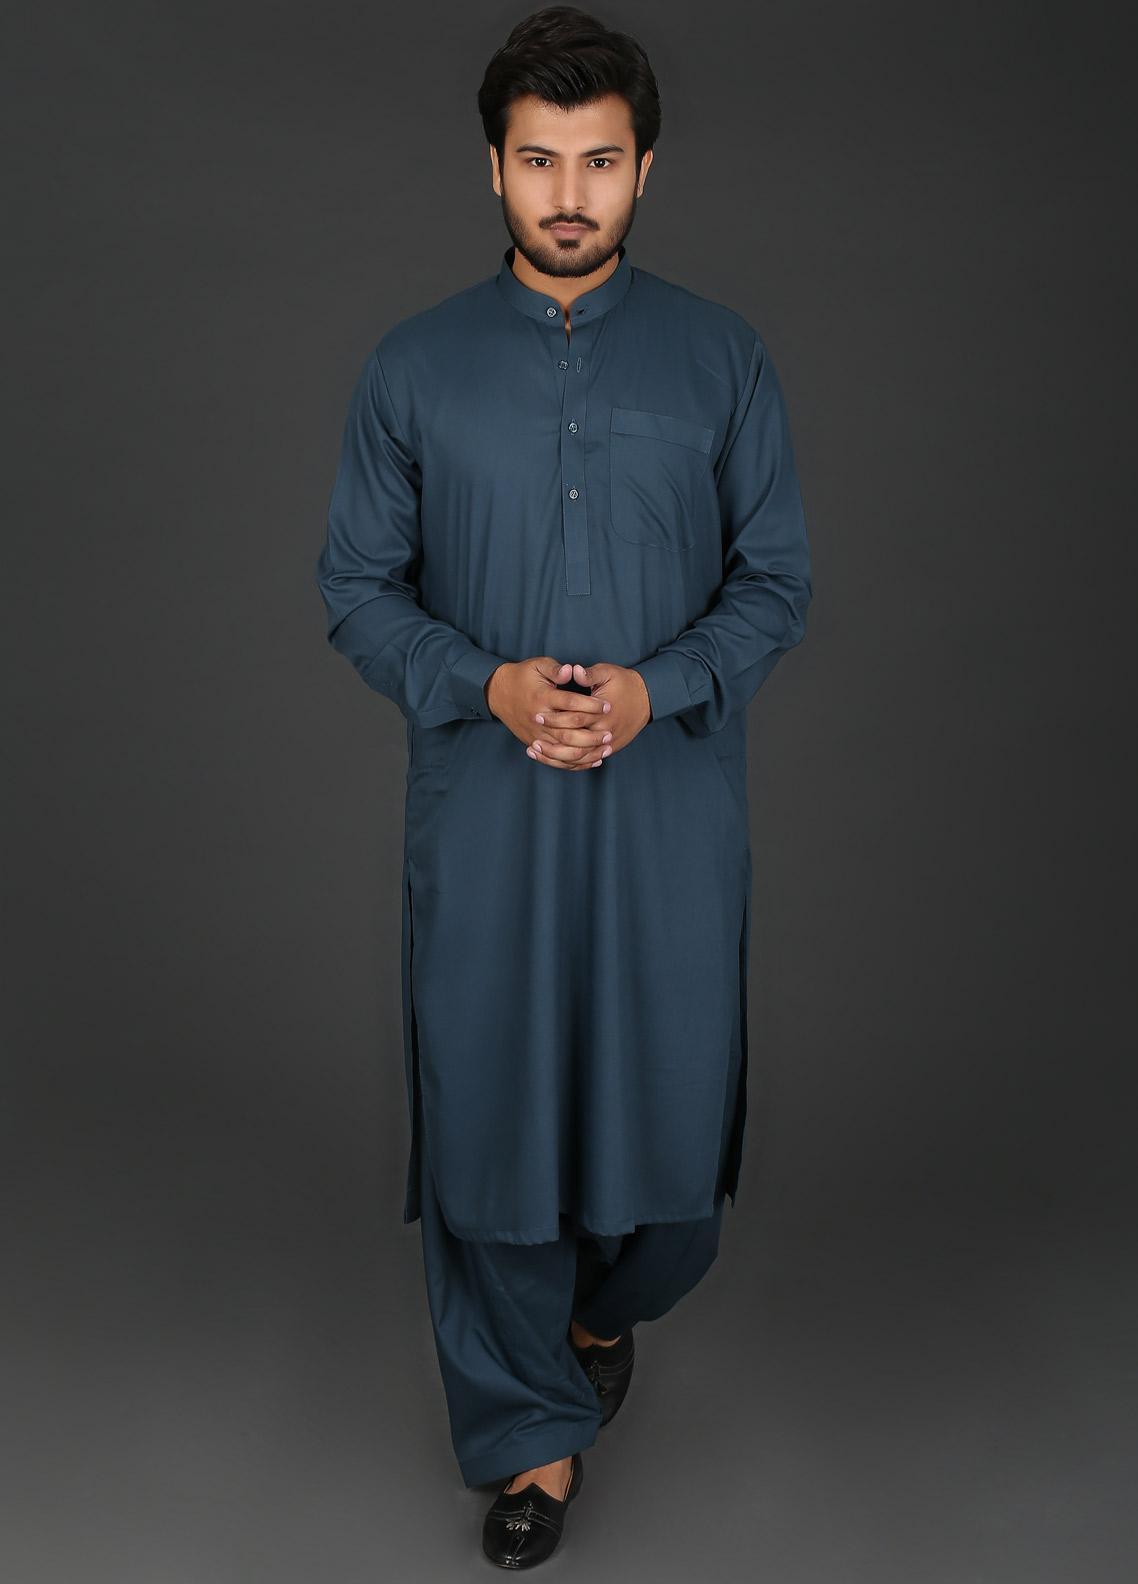 a3dfb588d5 Sanaulla Exclusive Range Cotton Formal Men Kameez Shalwar - P-4 Sea Green